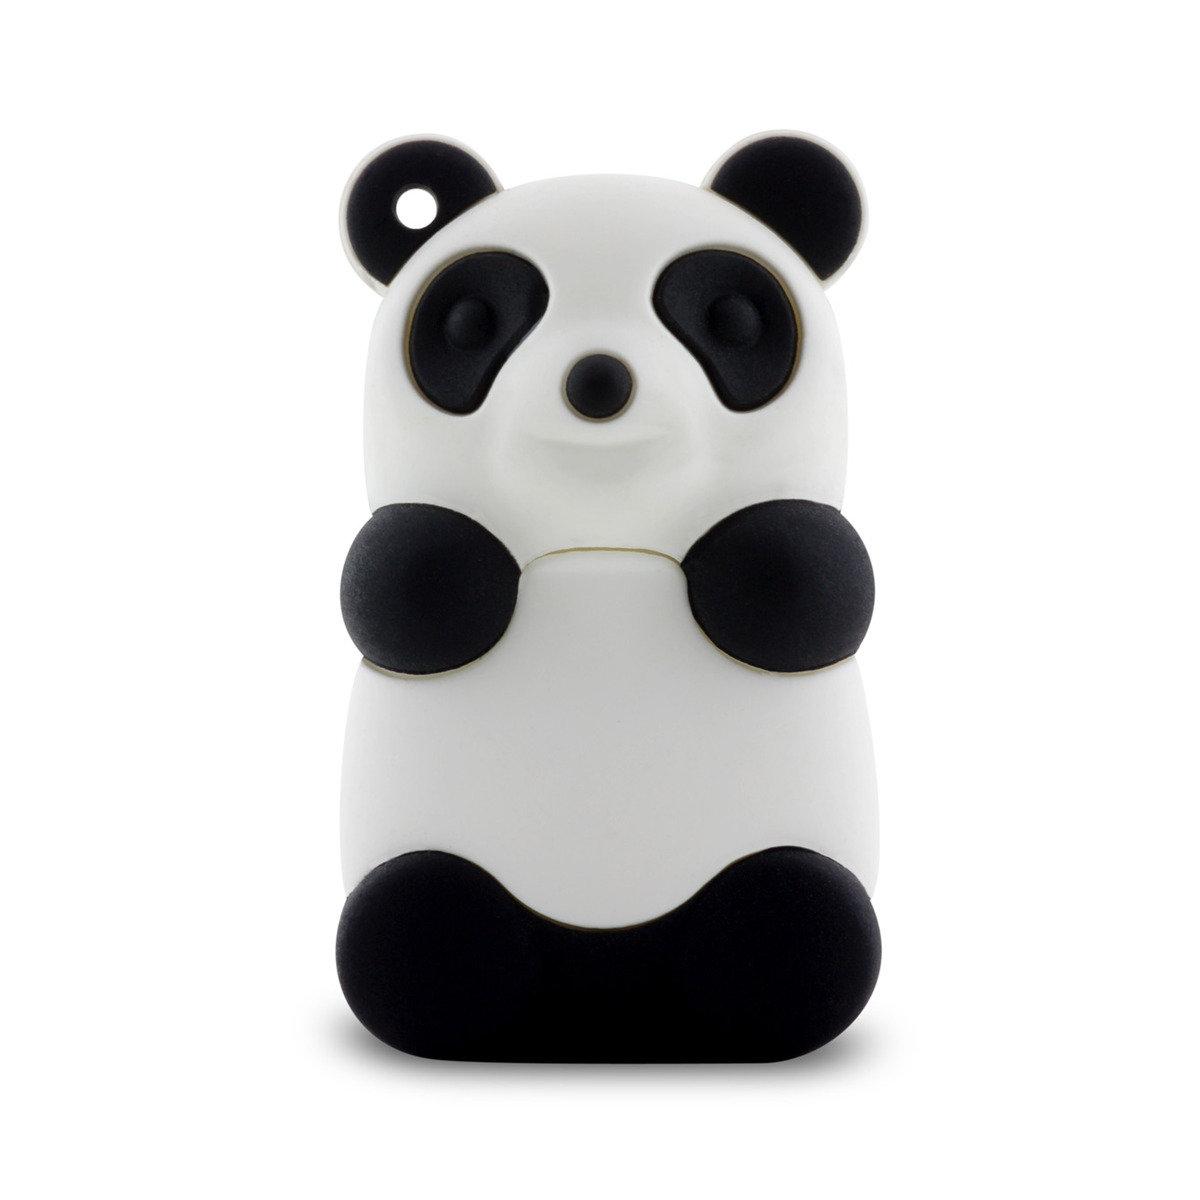 熊貓16GB隨身碟